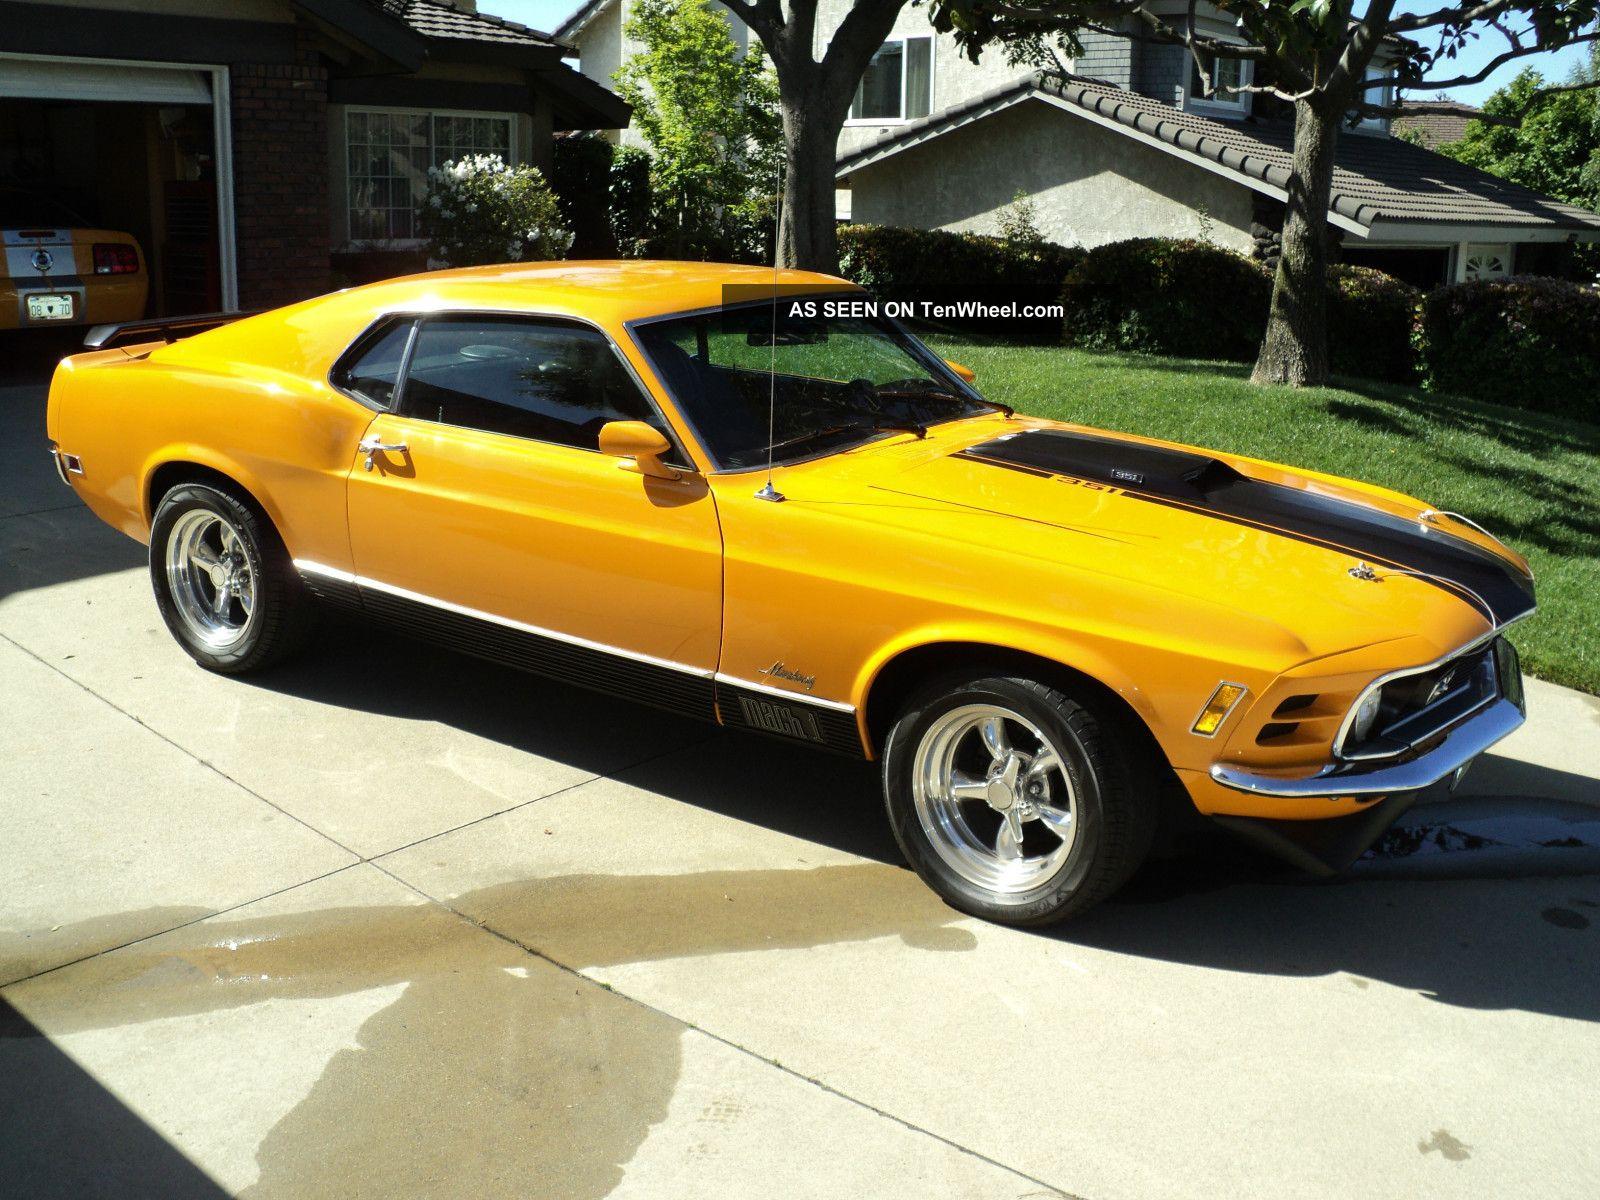 1970 Mustang Mach 1 Fastback 4 Speed Total Restoration